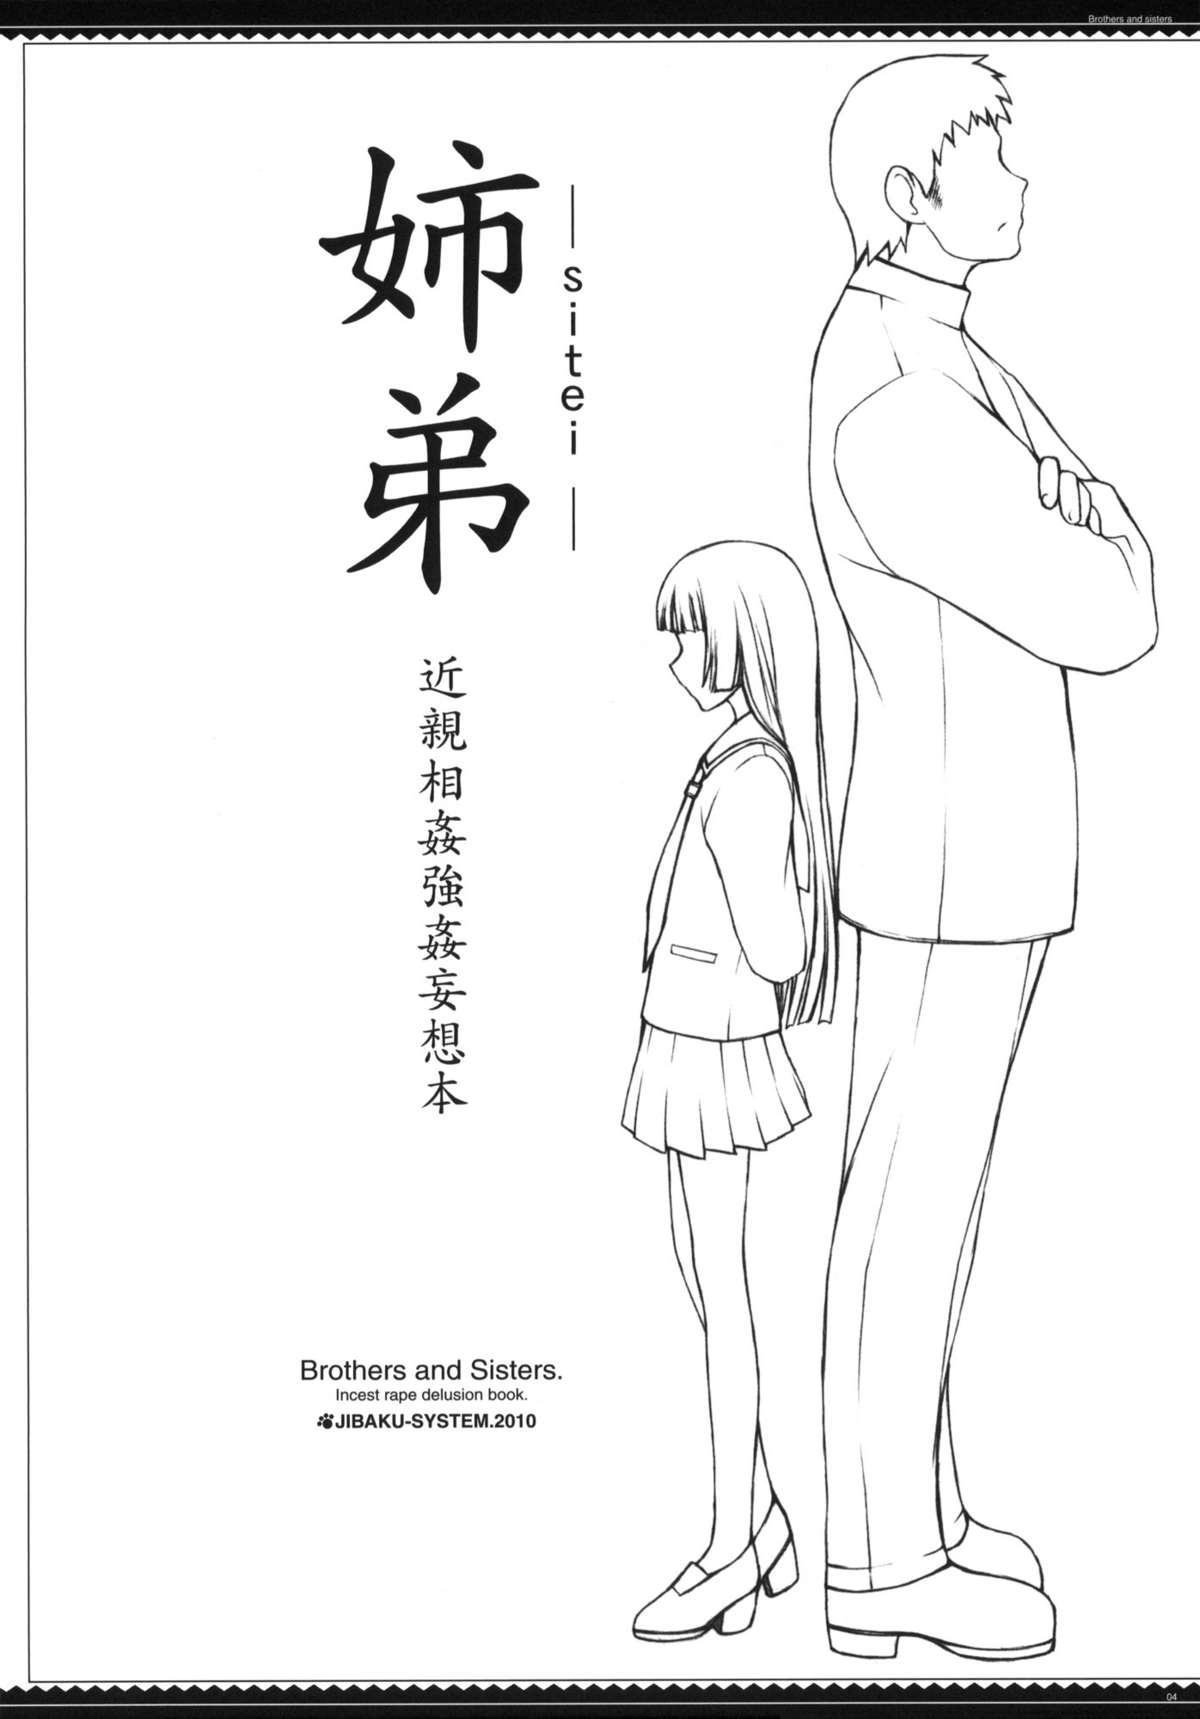 (COMITIA92)[JIBAKU SYSTEM] Sitei-sitei- Kinshin Soukan Goukan Mousouhon (Original) 3